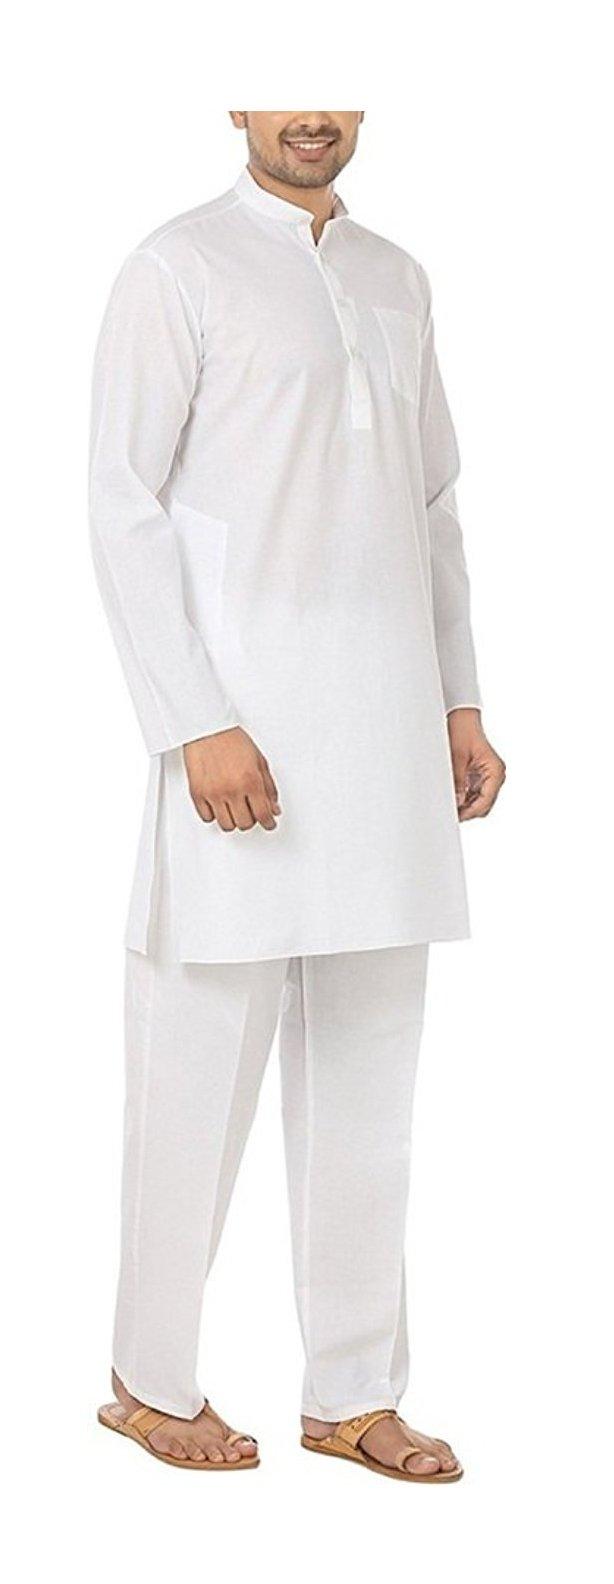 Royal Kurta Men's Fine Cotton Kurta Pyjama Set 46 White by Royal Kurta (Image #3)